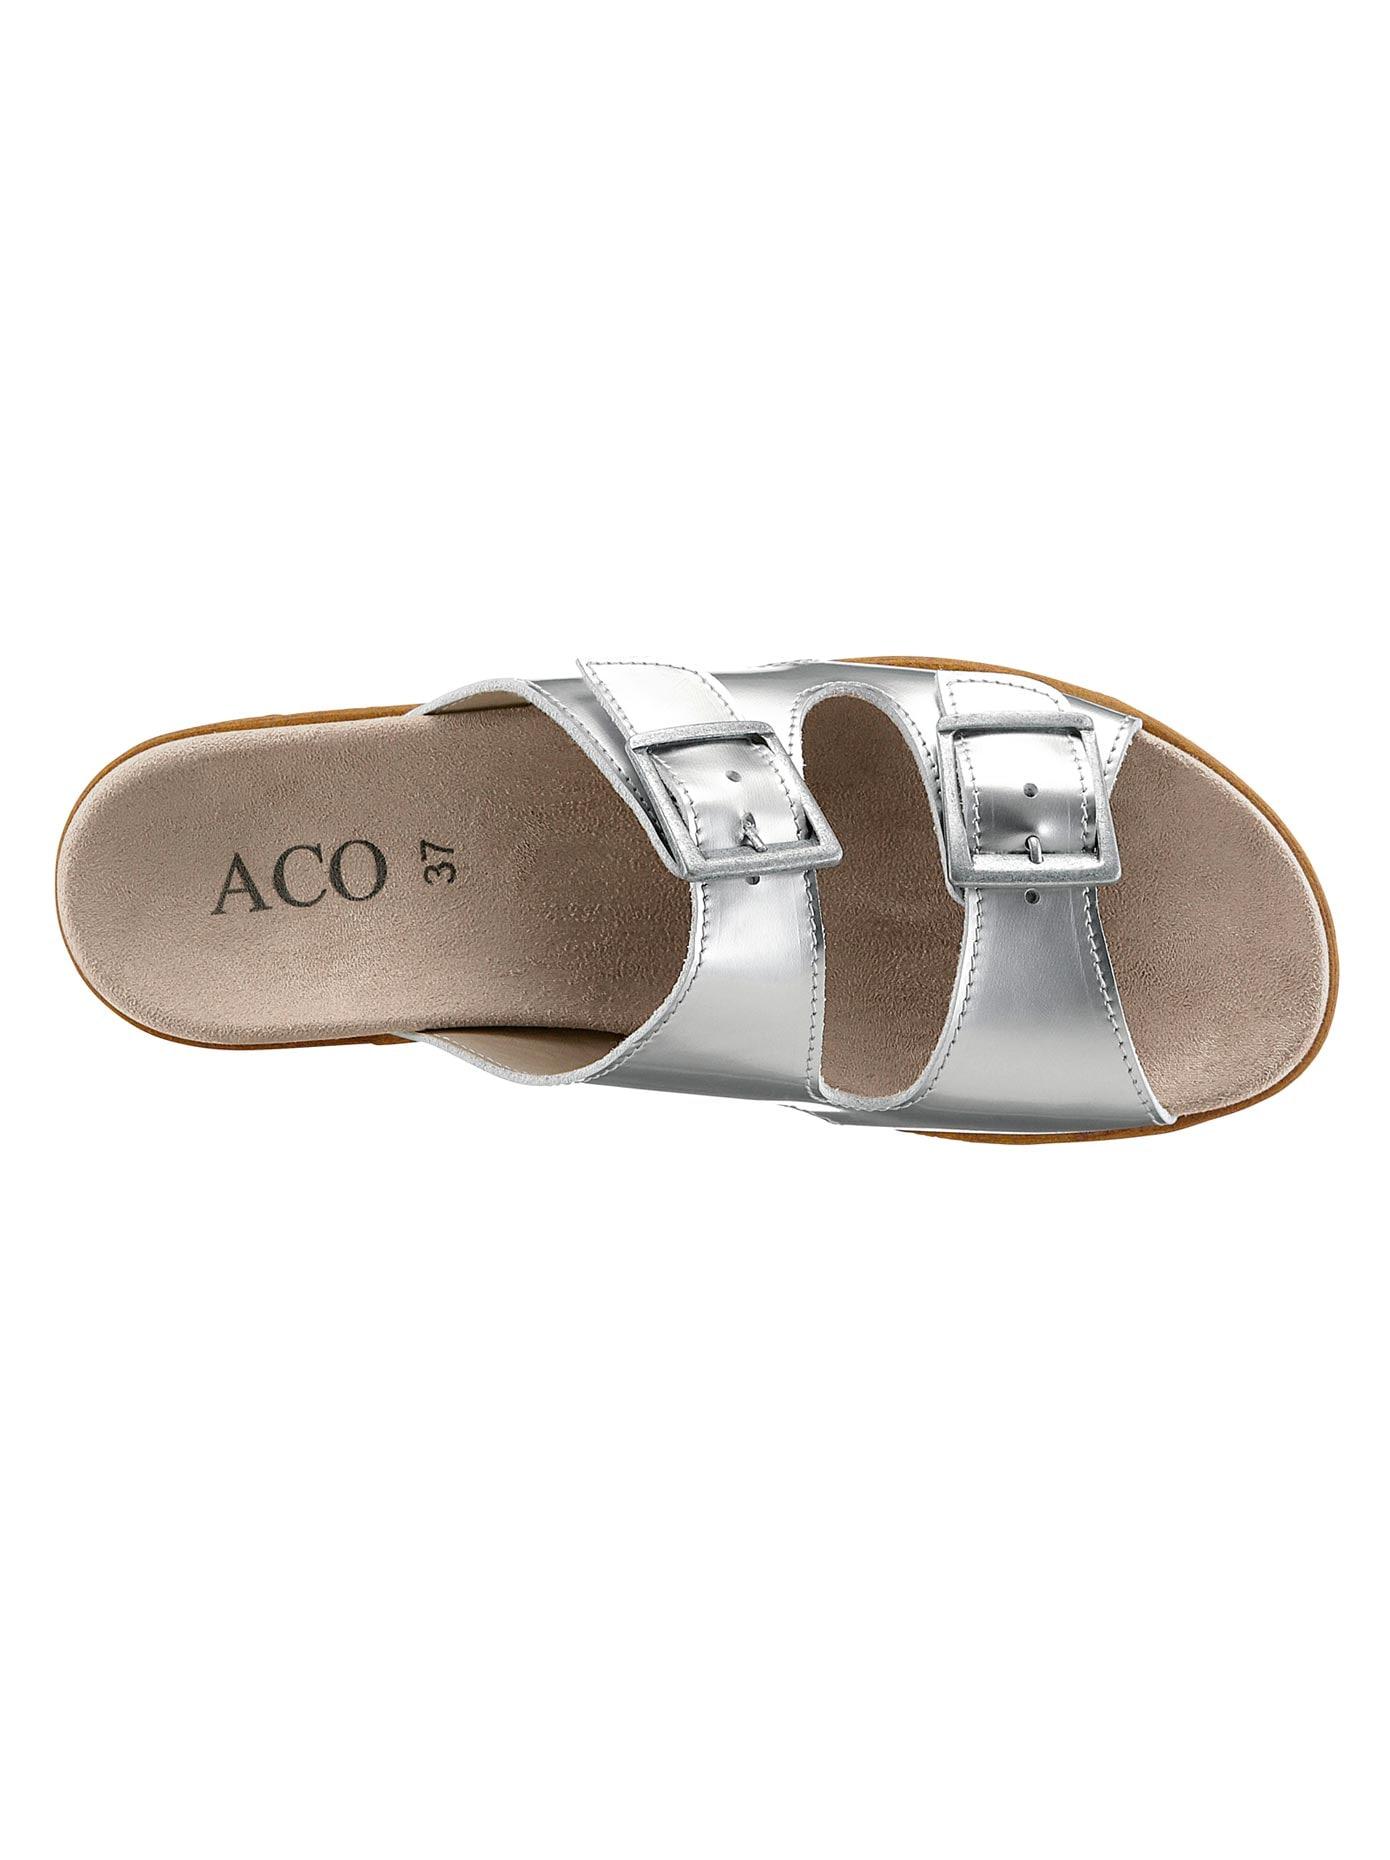 Image of Aco Pantolette mit gepolstertem Wechselfussbett